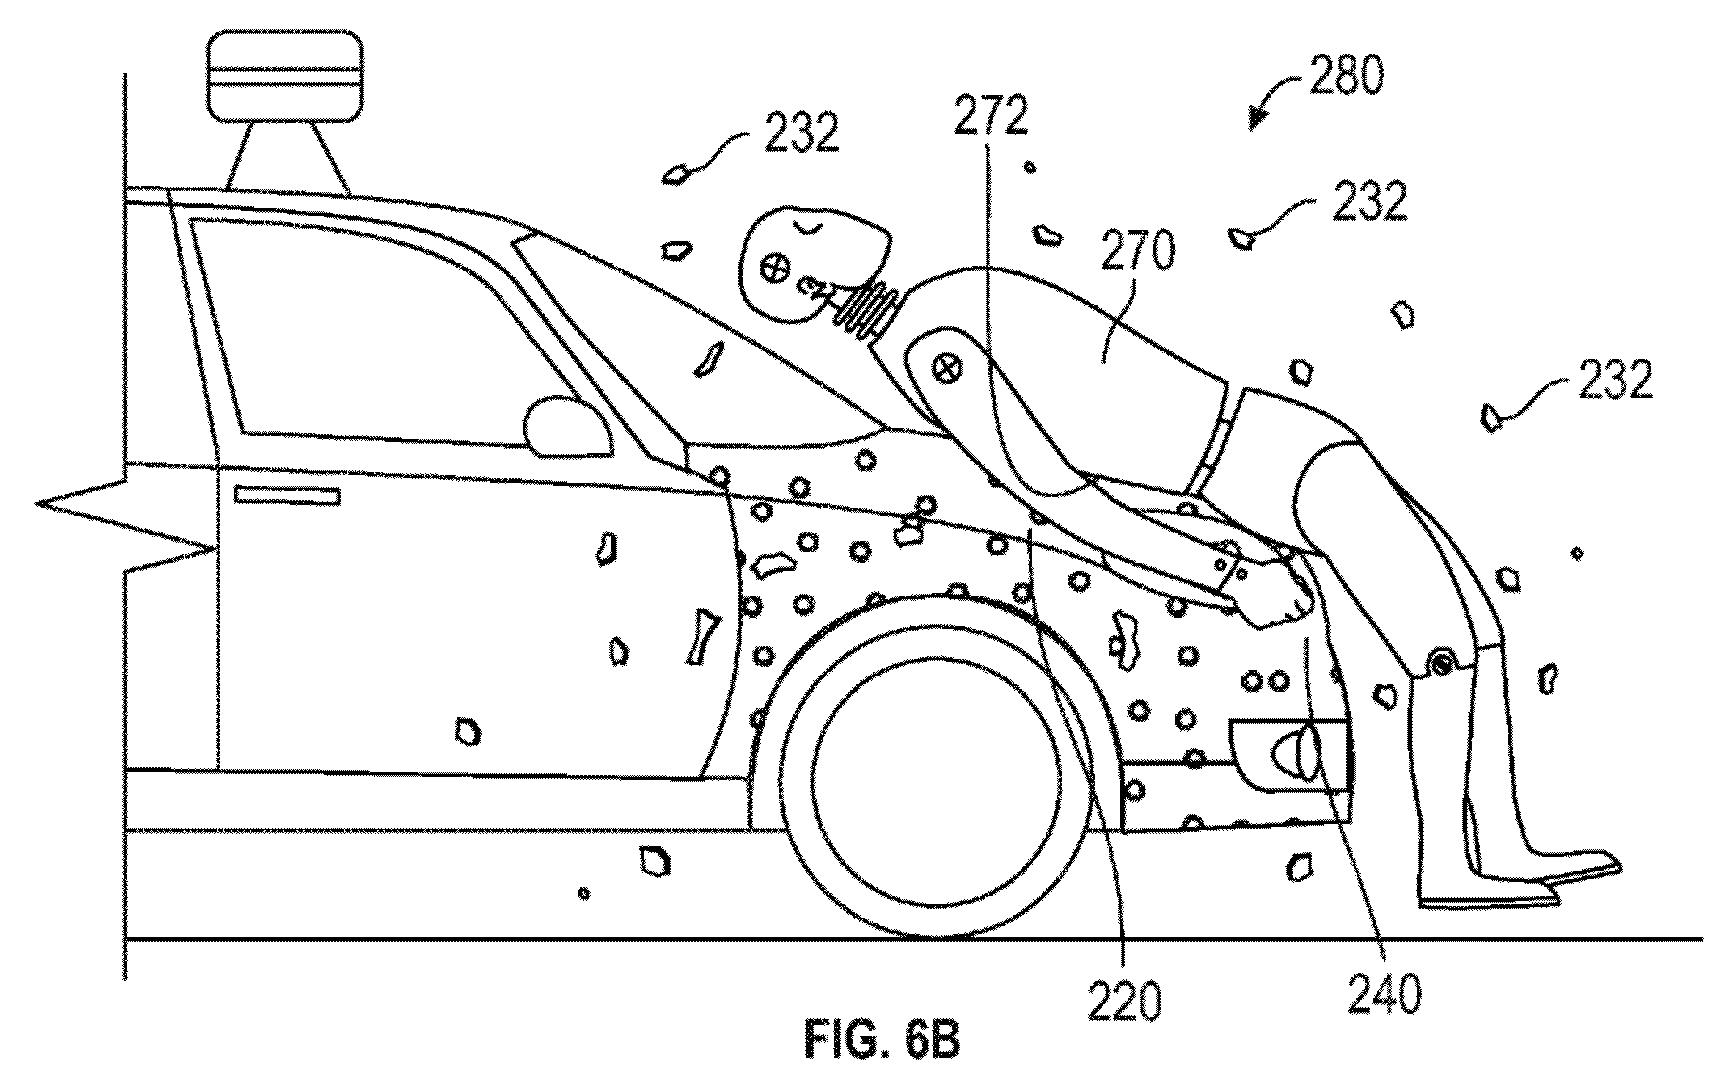 Google's Pedestrian Flypaper Patent